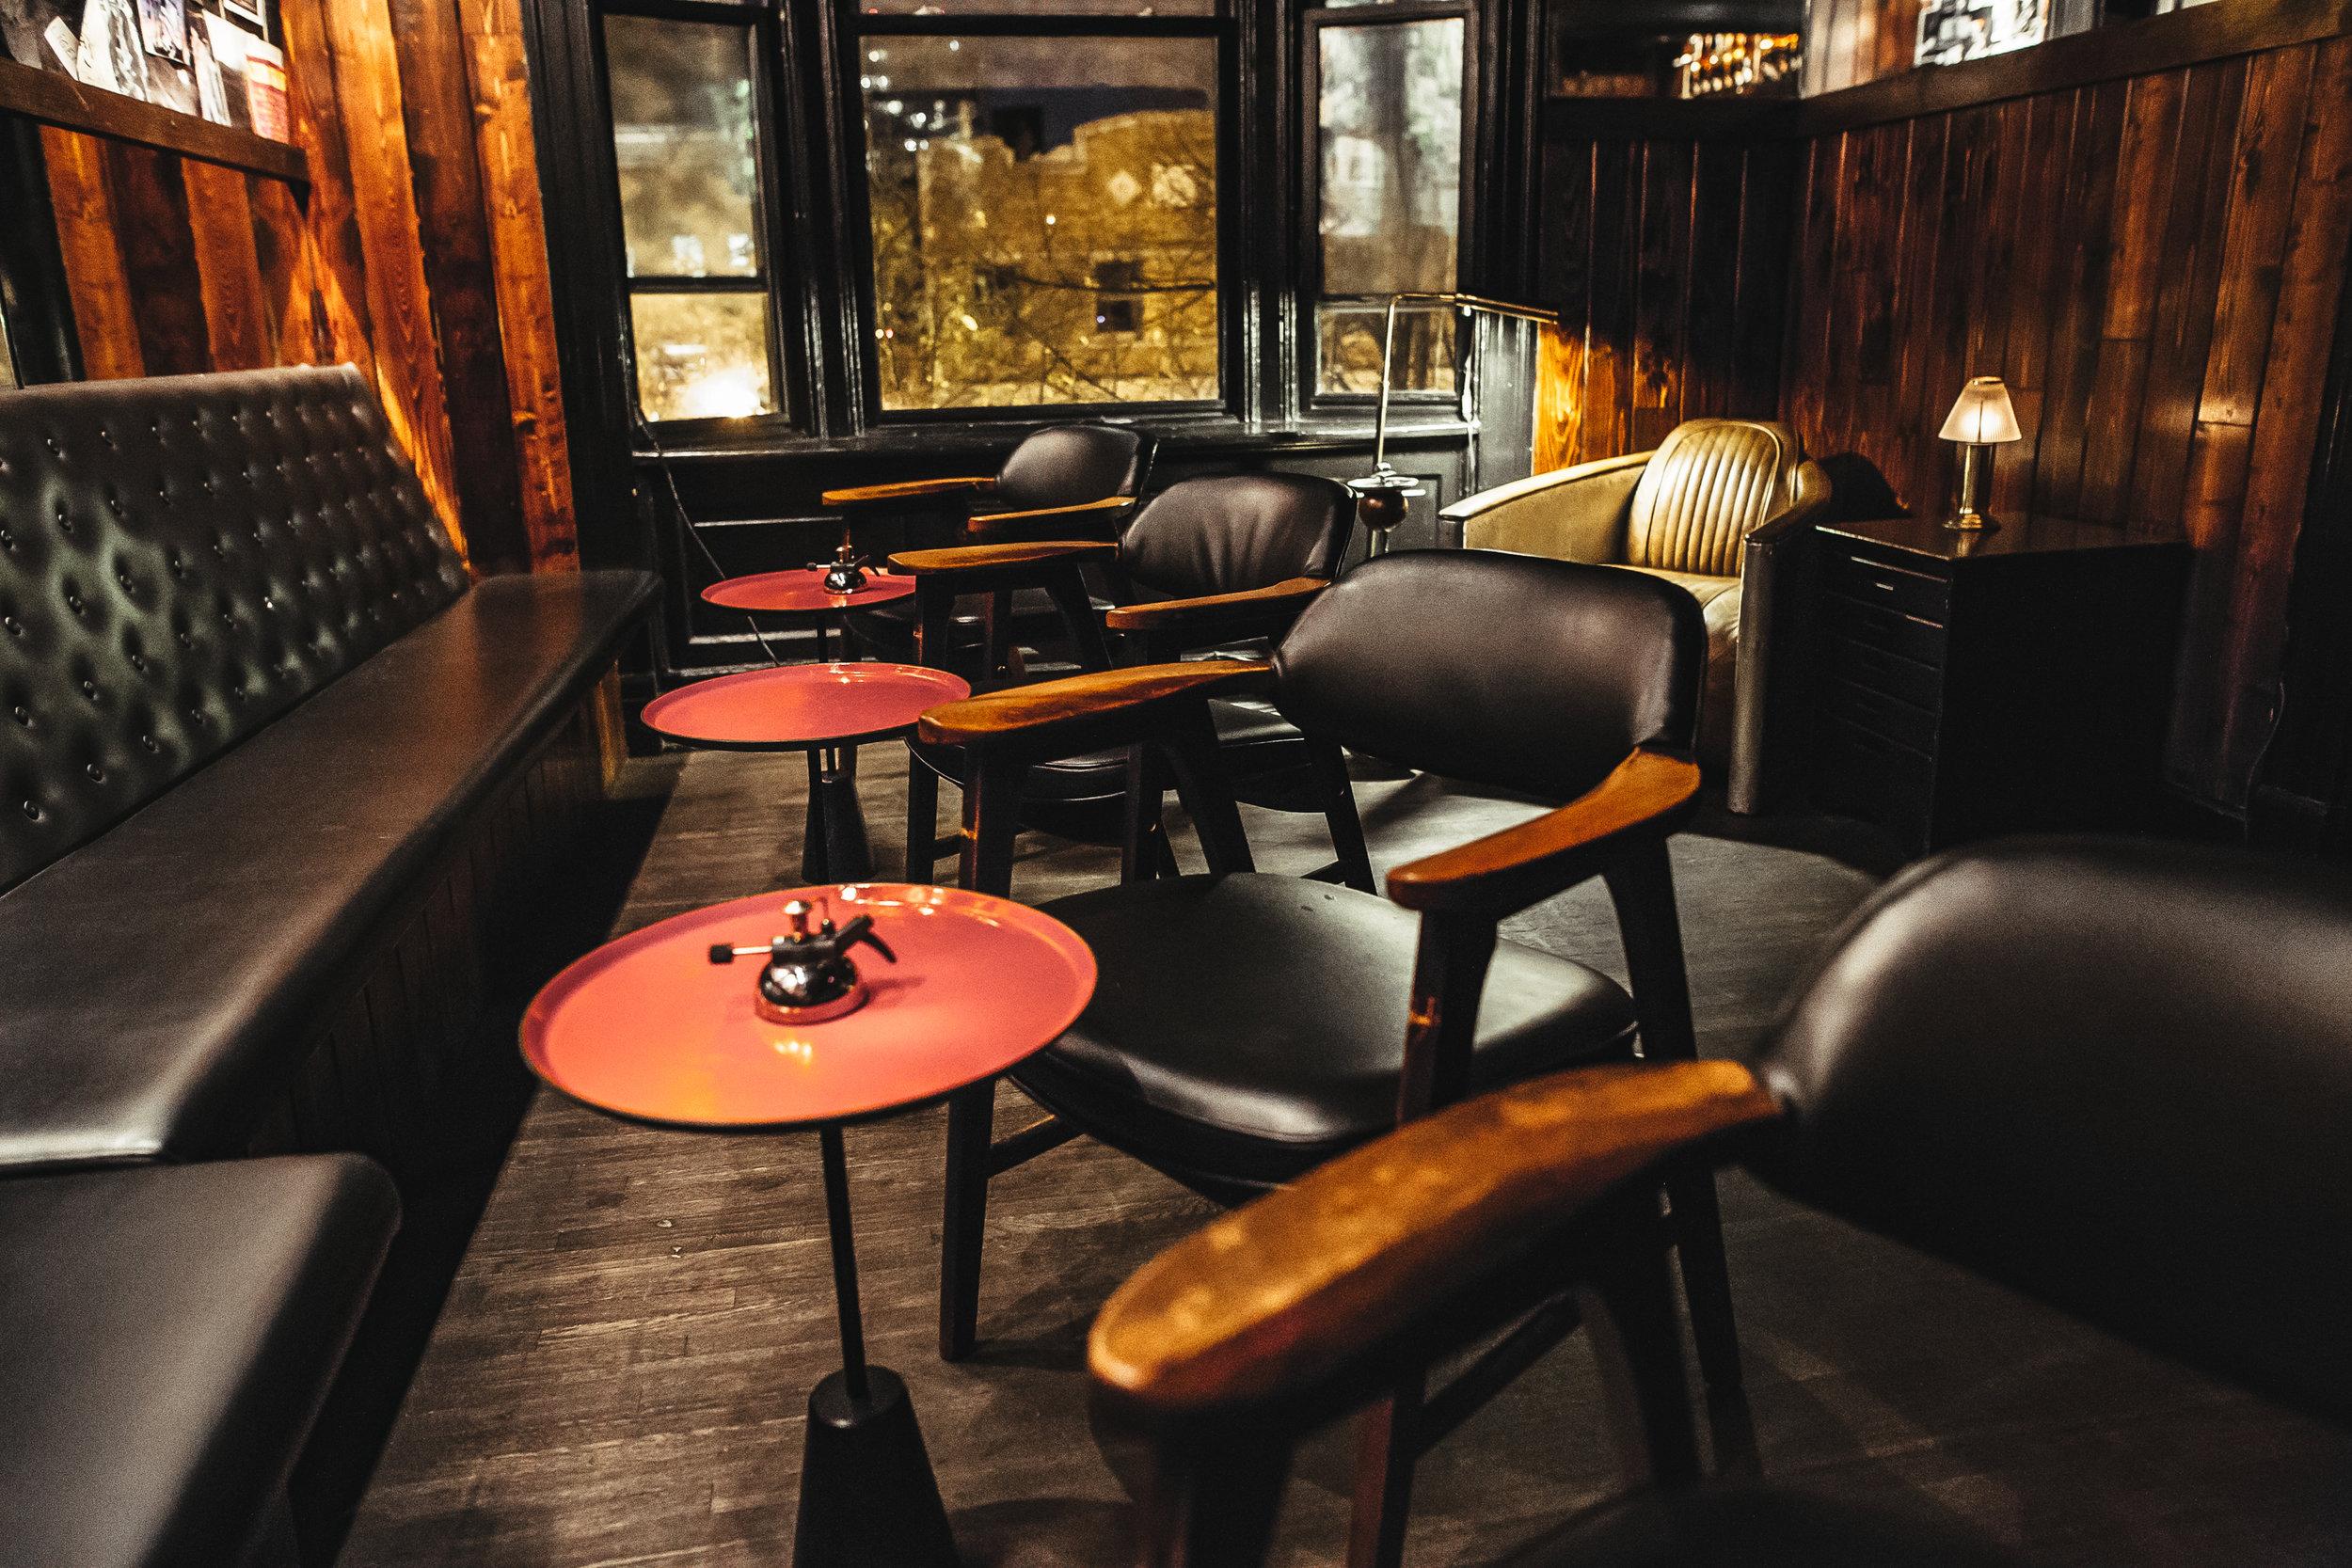 Durango-Cigar-Lounge-Main-Room-Seating.jpg